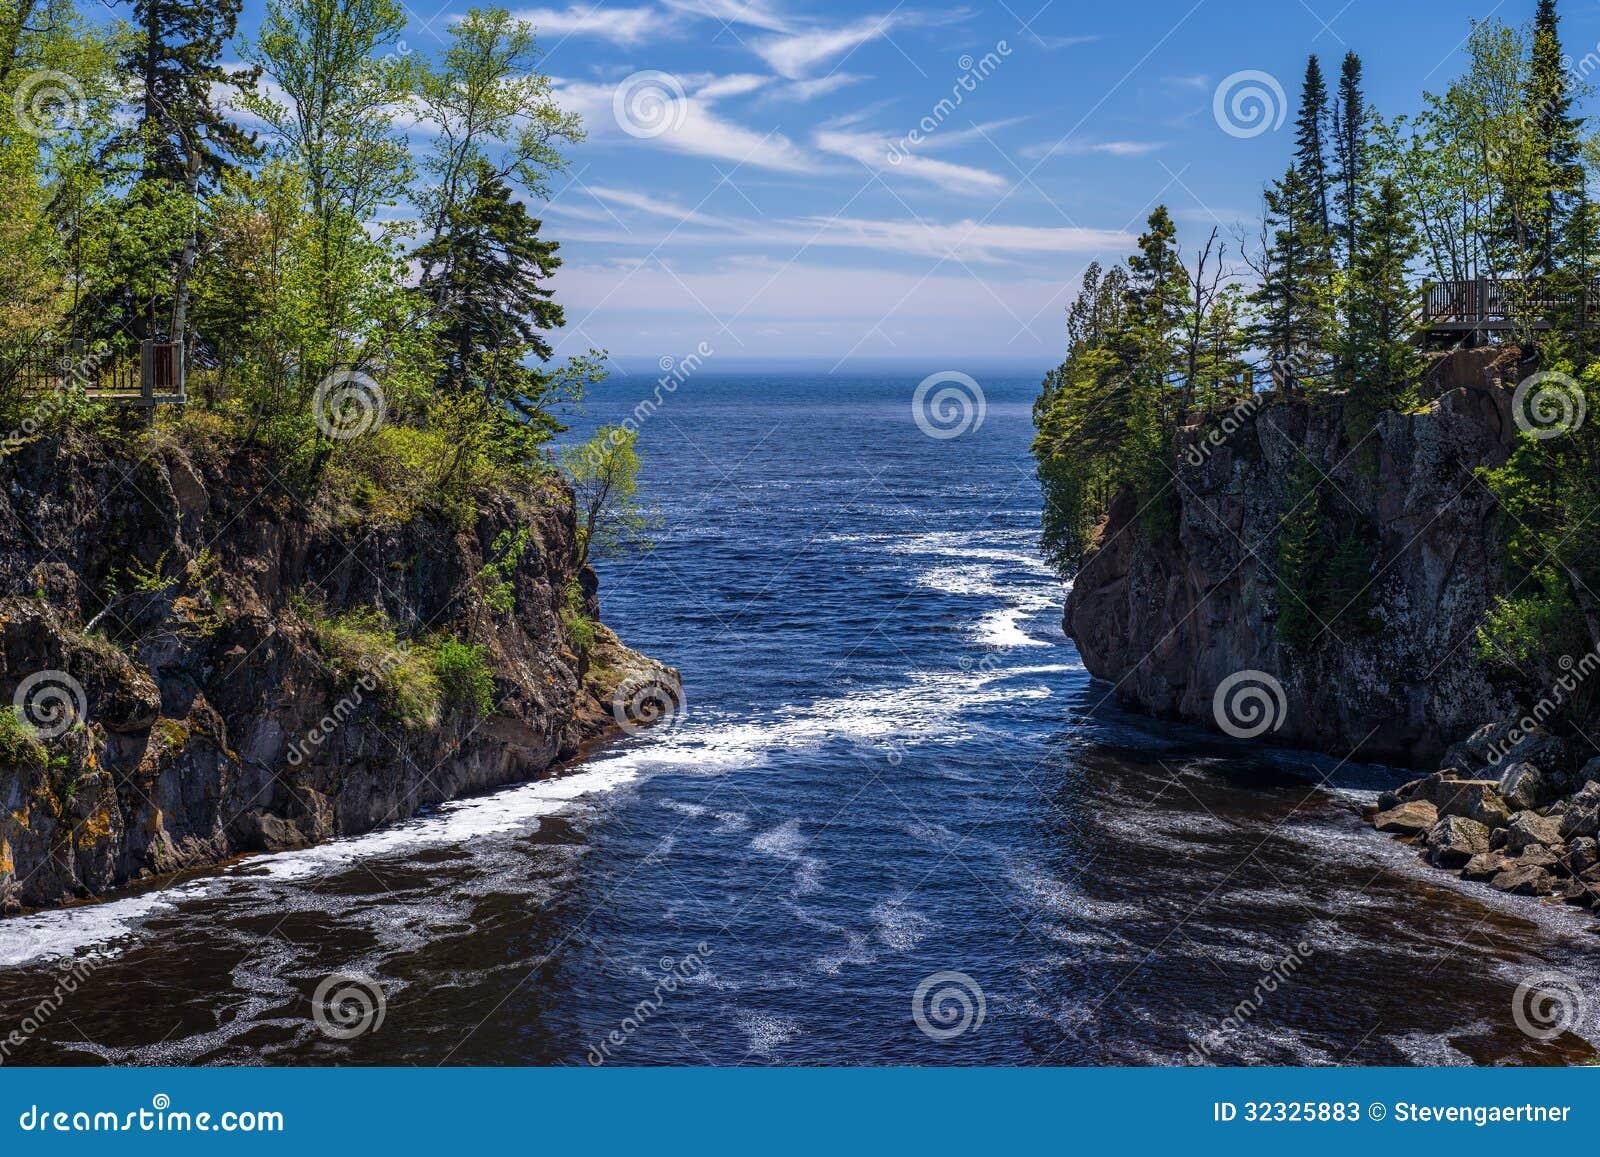 Absolutismflod, Lake Superior